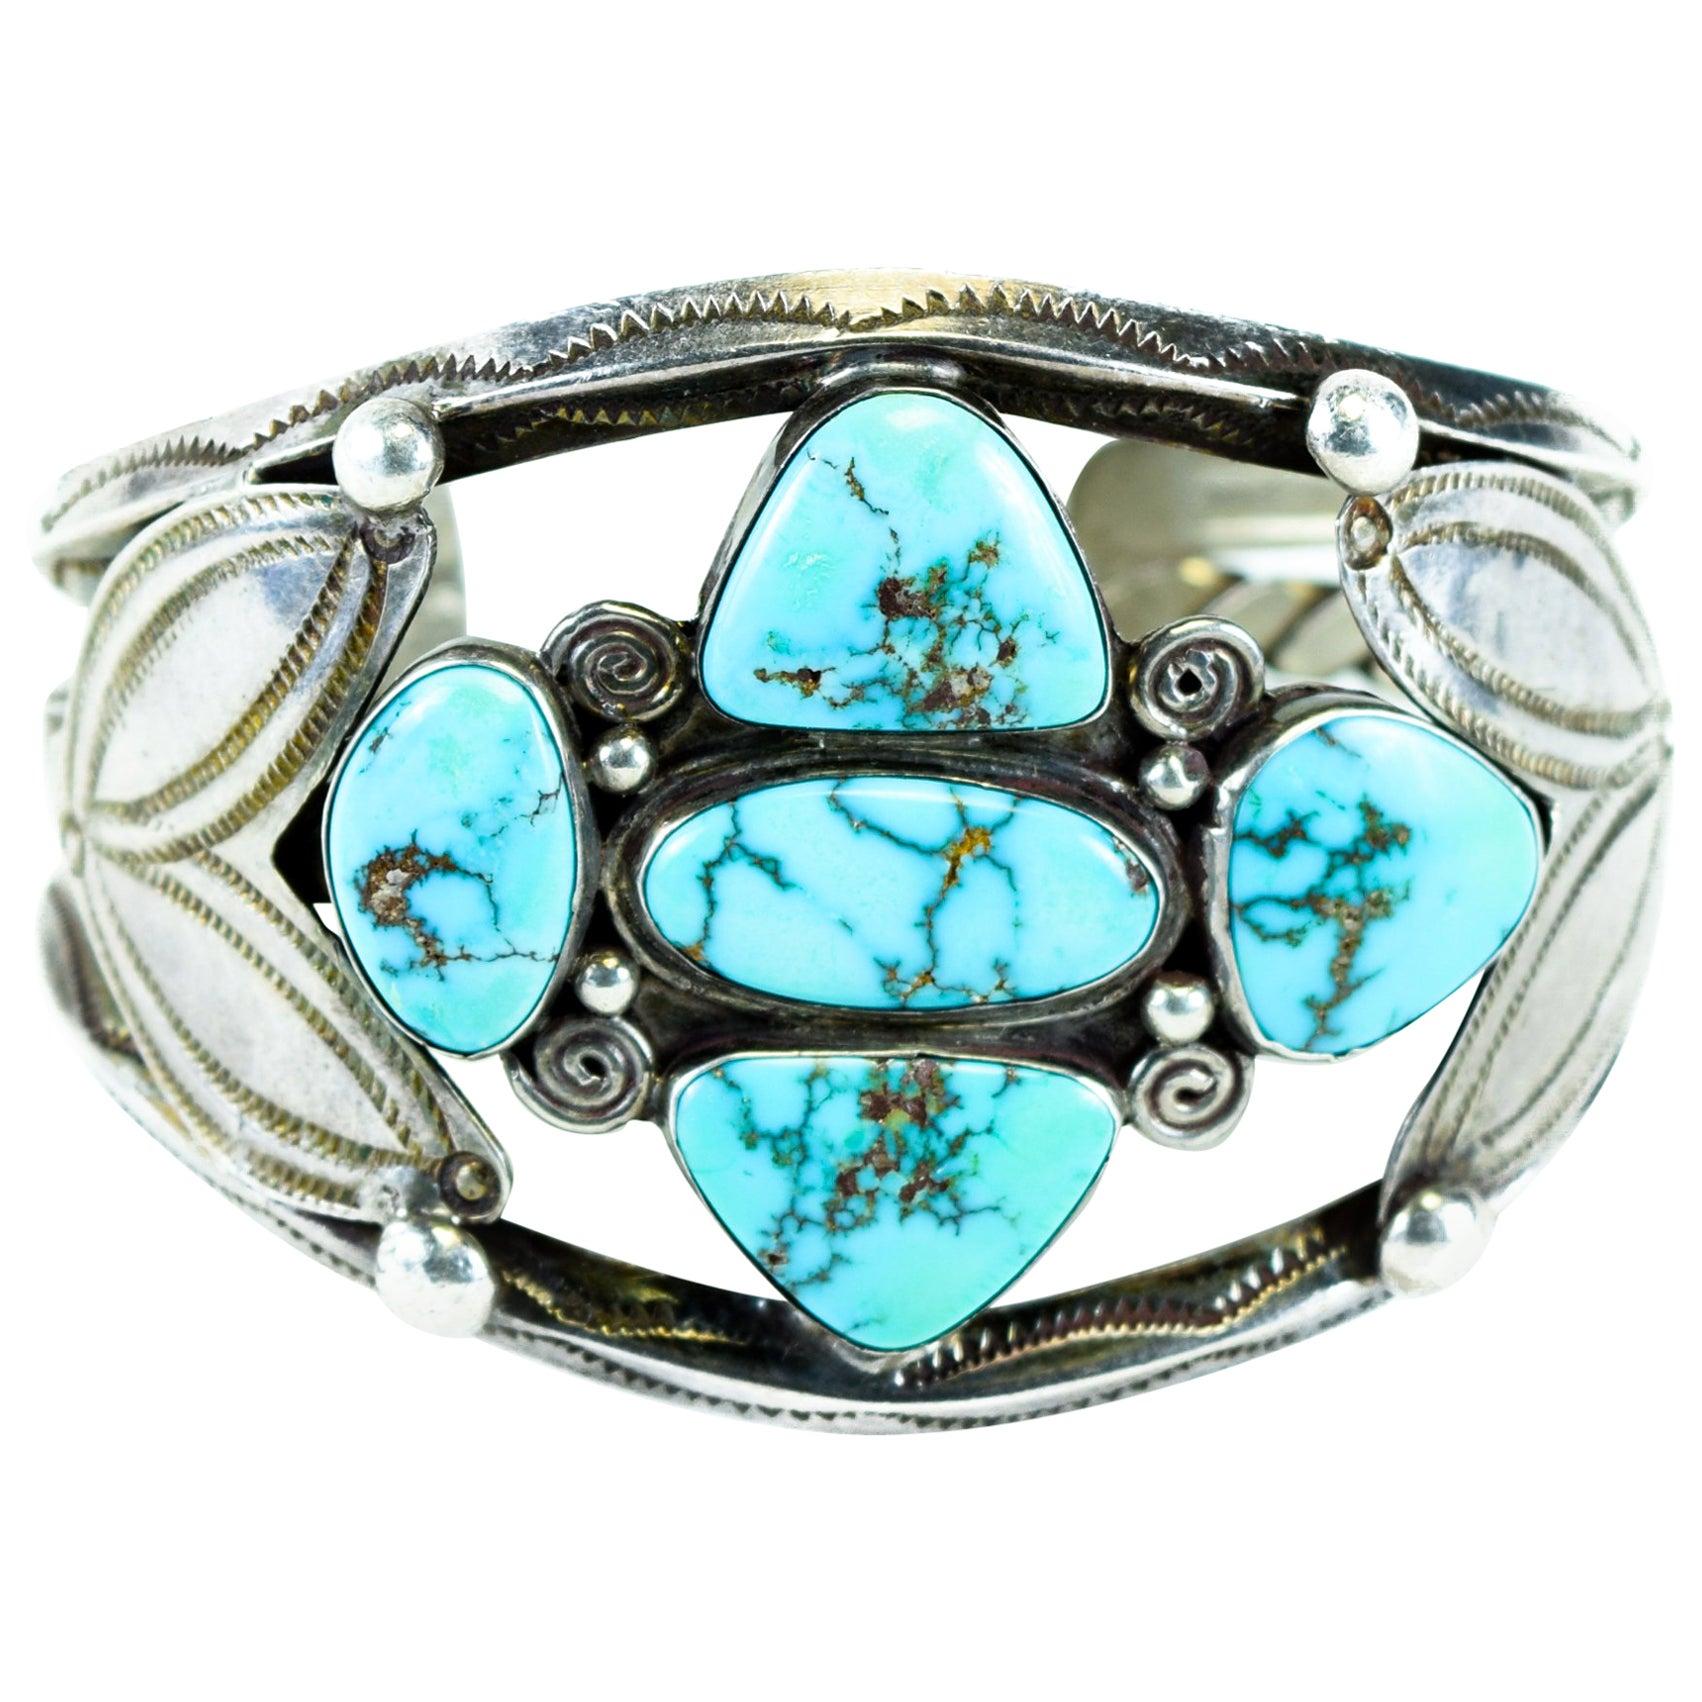 Navajo Morenci Turquoise Bracelet